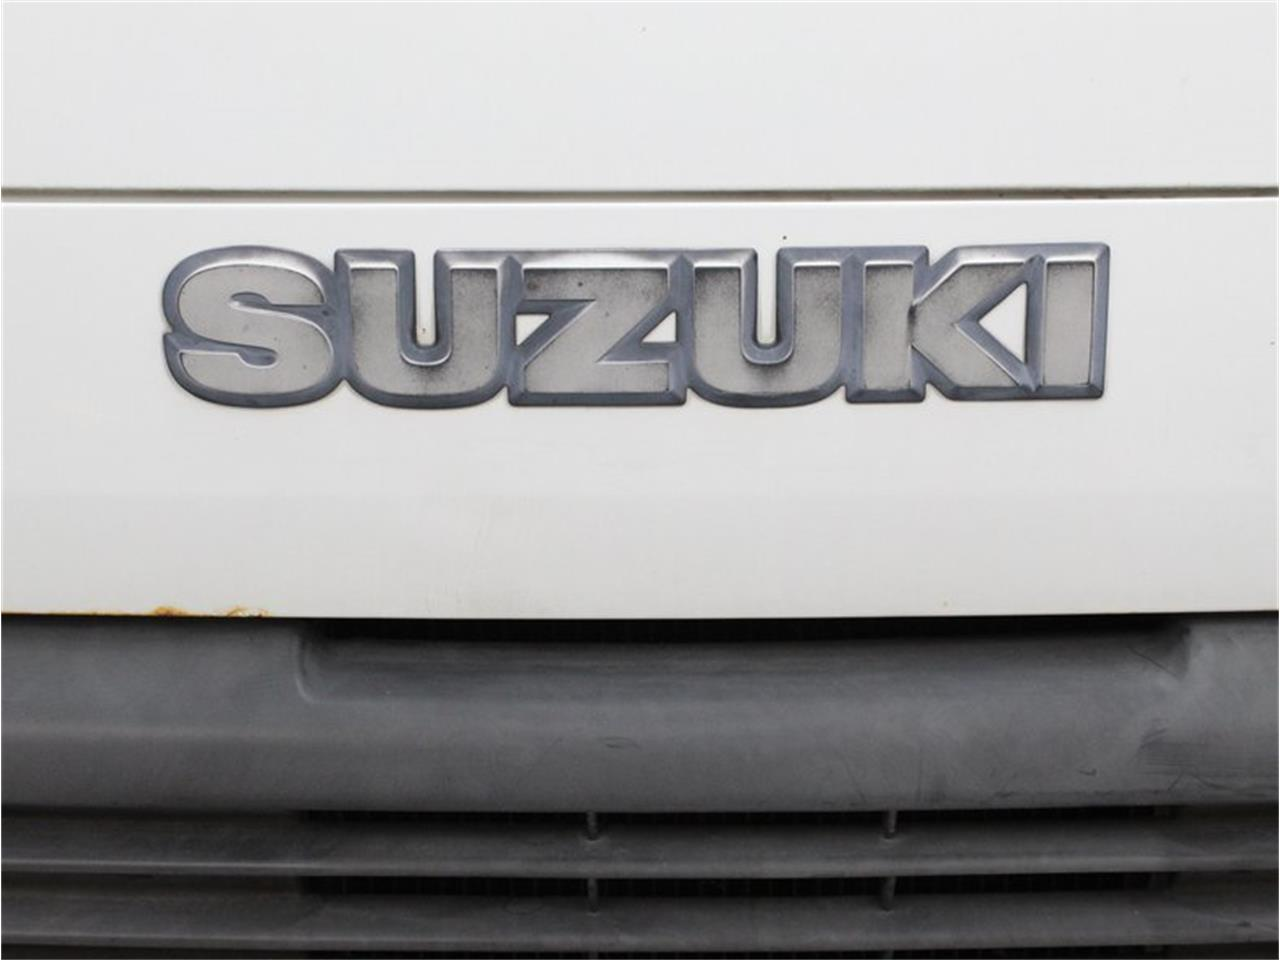 1995 Suzuki Carry (CC-1415445) for sale in Christiansburg, Virginia